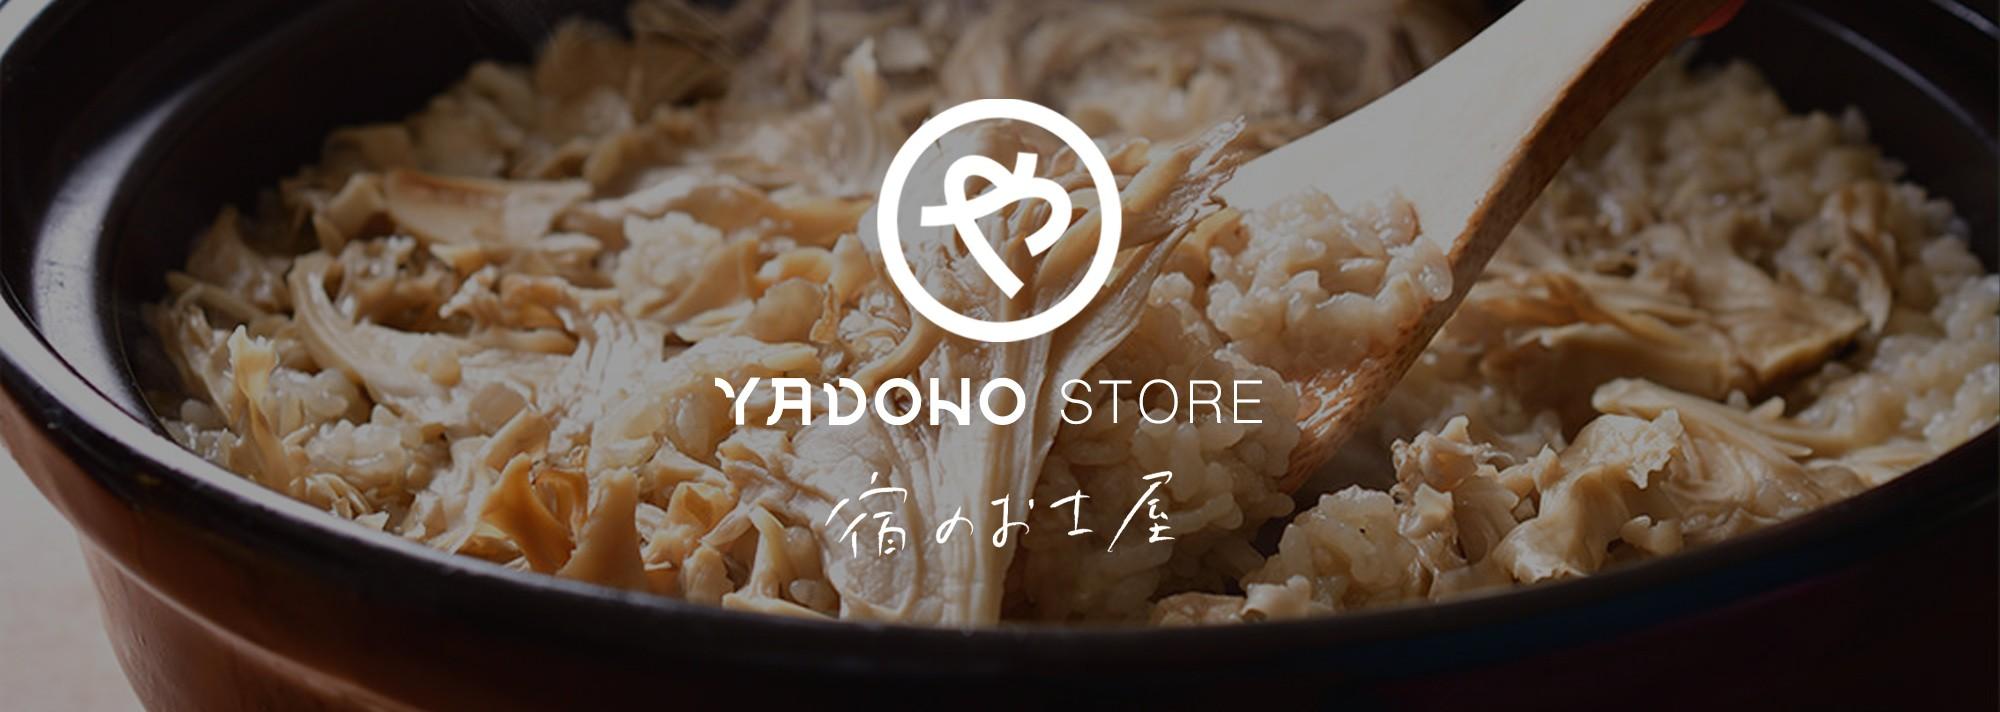 YADONO STORE〈やどのストア〉